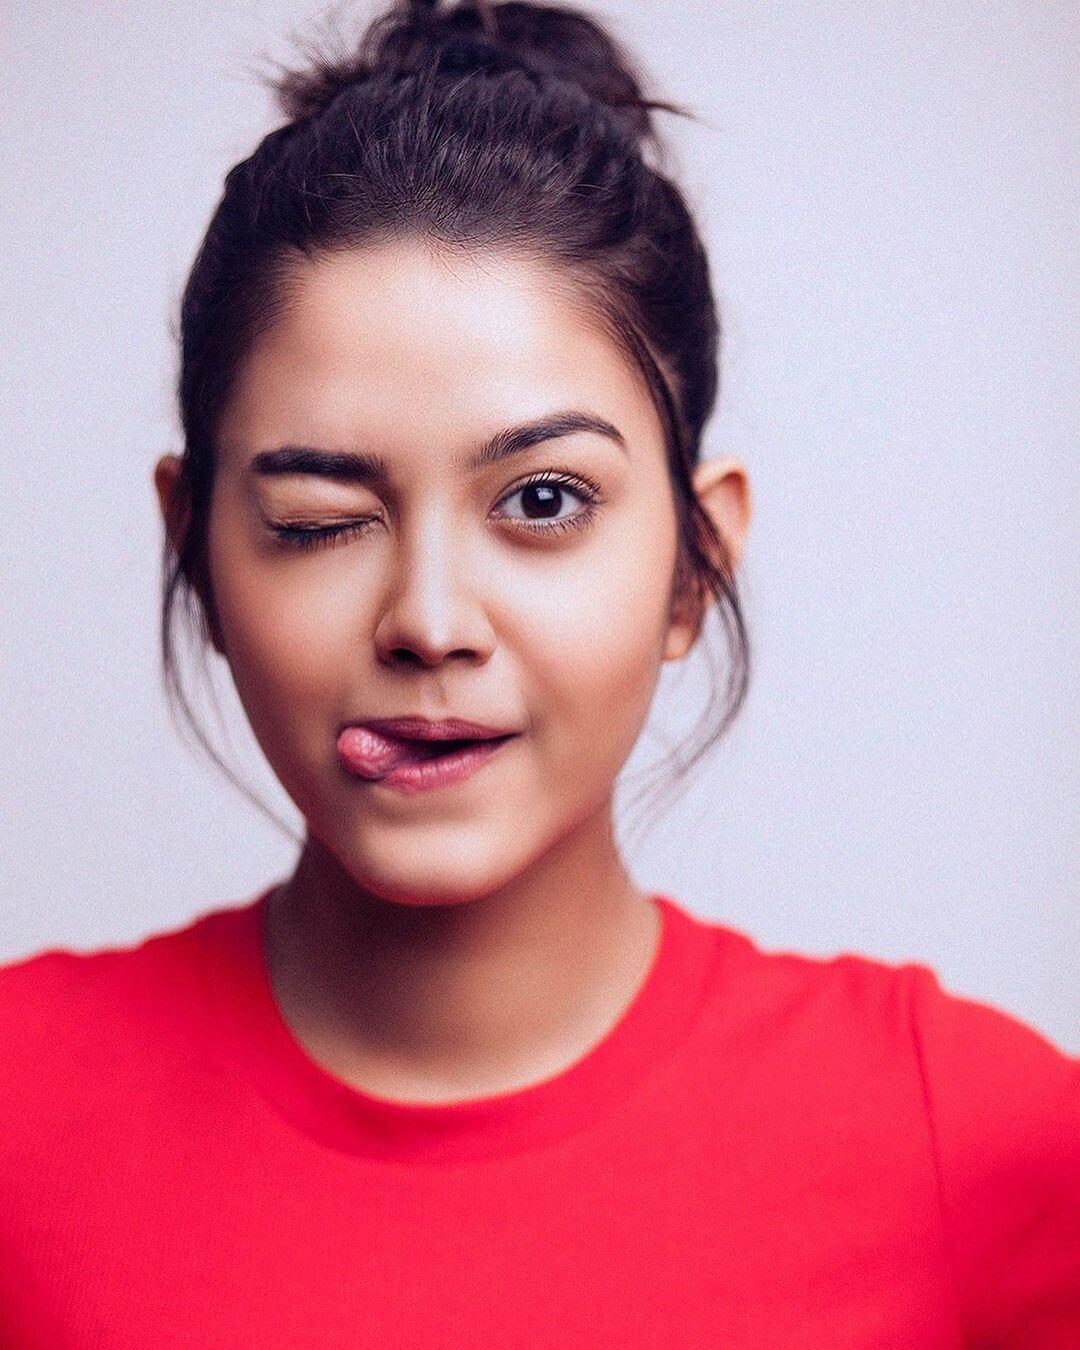 Priyal Mahajan On Red T Shirt